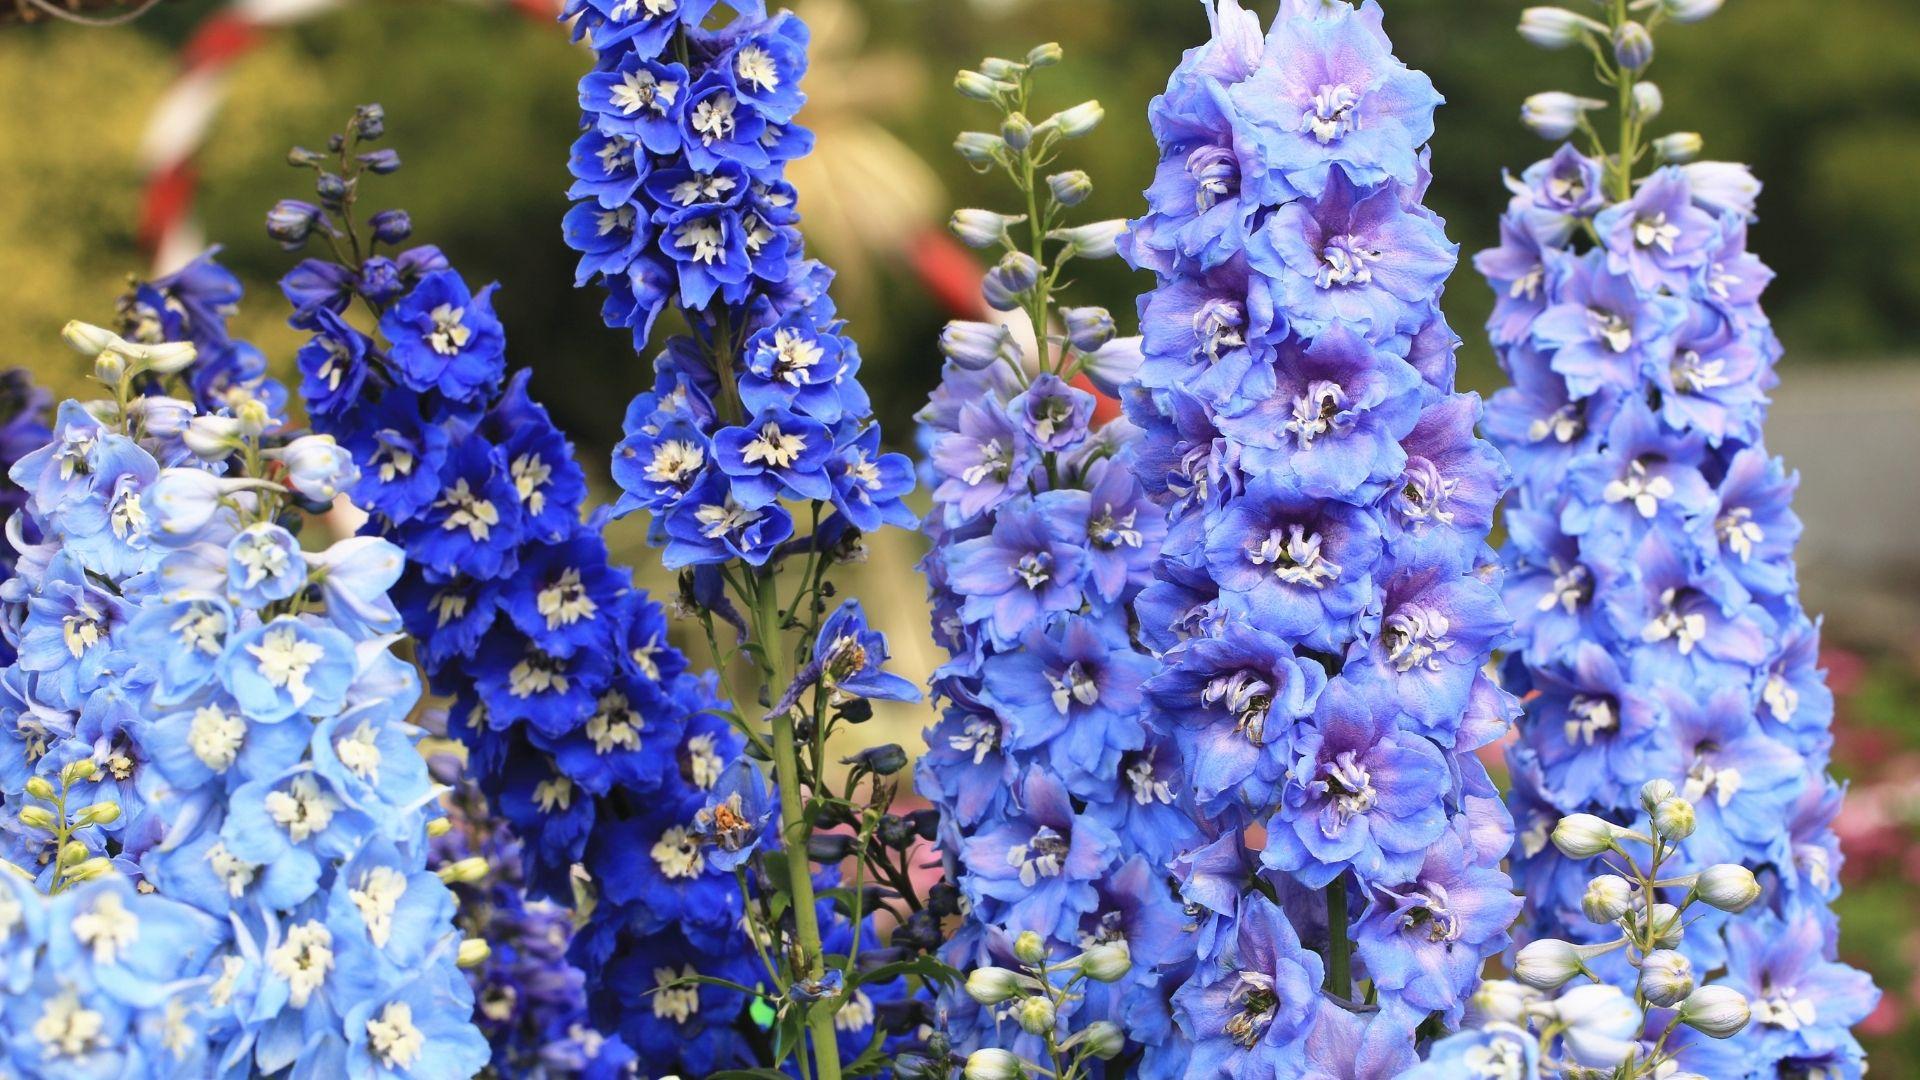 Delphinium - Blue Flowers